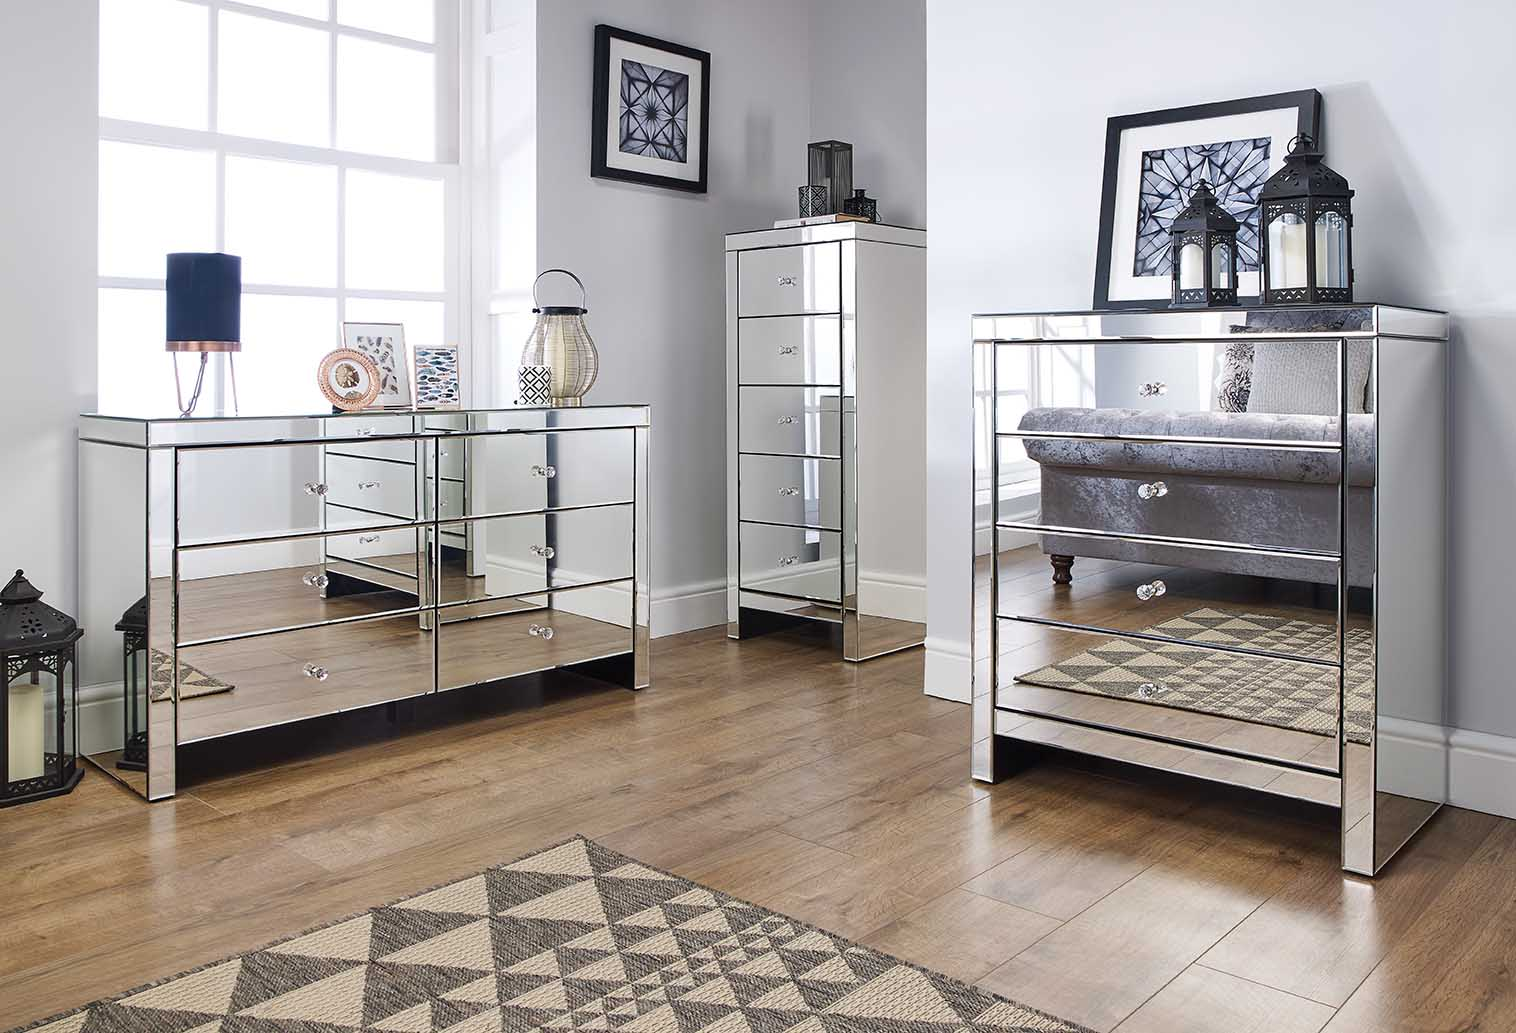 Birlea seville mirrored bedroom furniture range mock crystal handles assembled